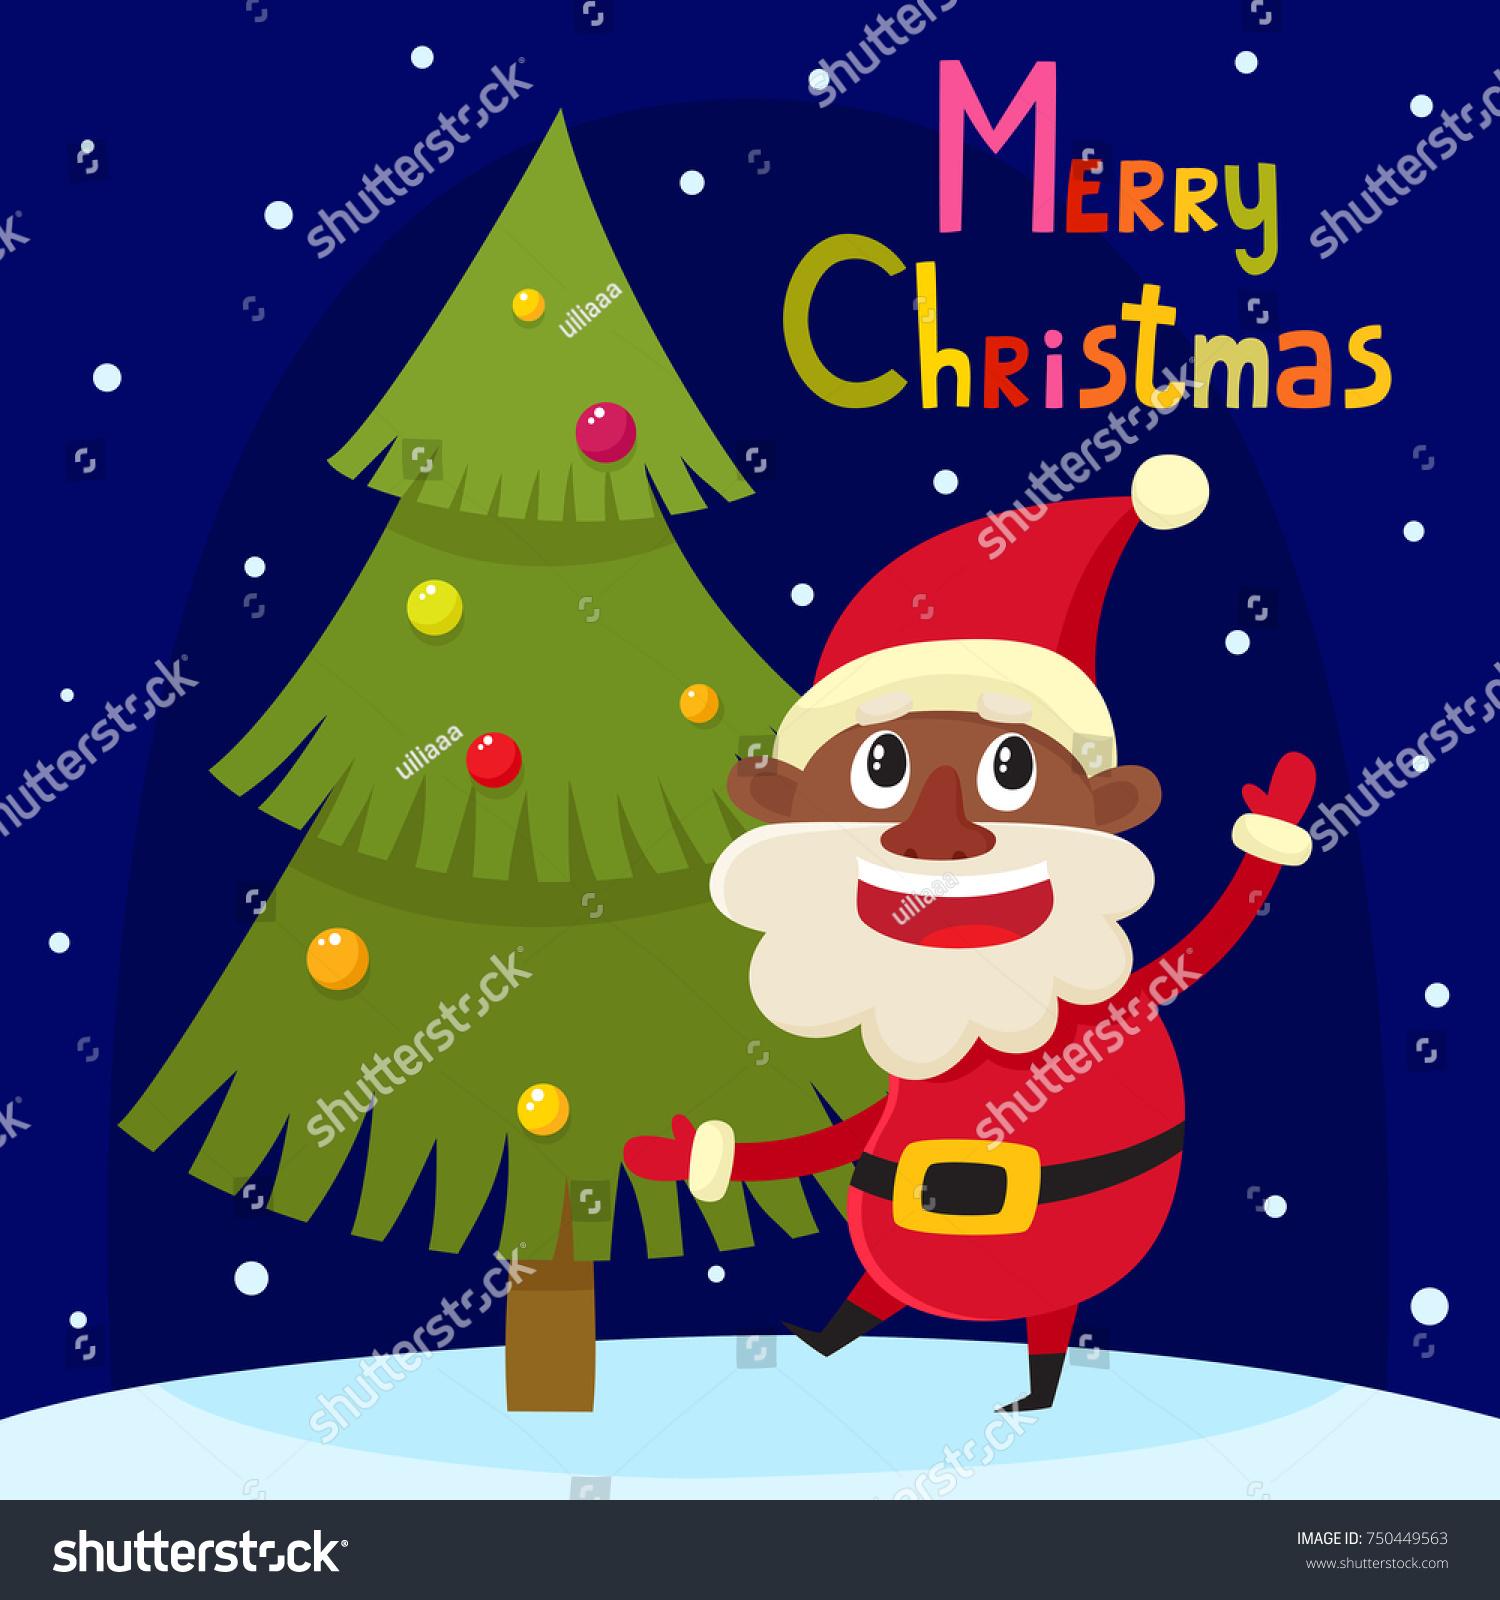 Christmas greeting card cartoon african santa stock vector 750449563 christmas greeting card with cartoon african santa claus cartoon vector characters symbol of new kristyandbryce Gallery